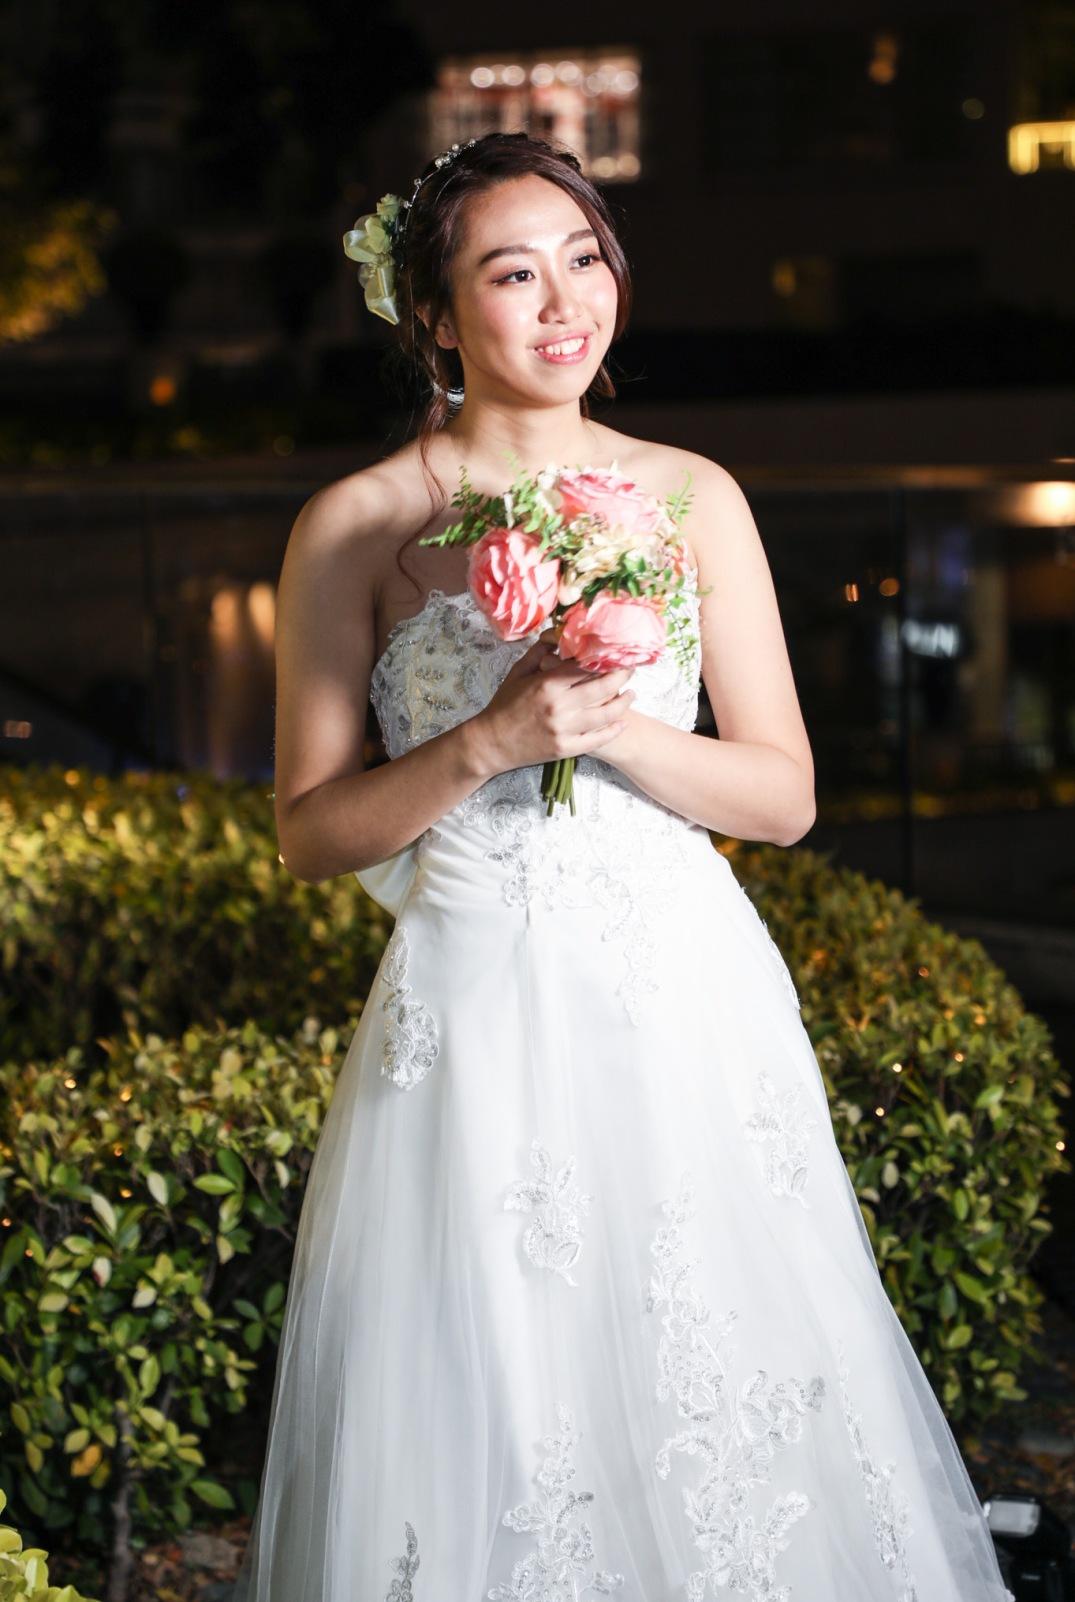 wedding big day photography hk 攝影價錢 香港婚禮攝影推薦 coolstylist-38